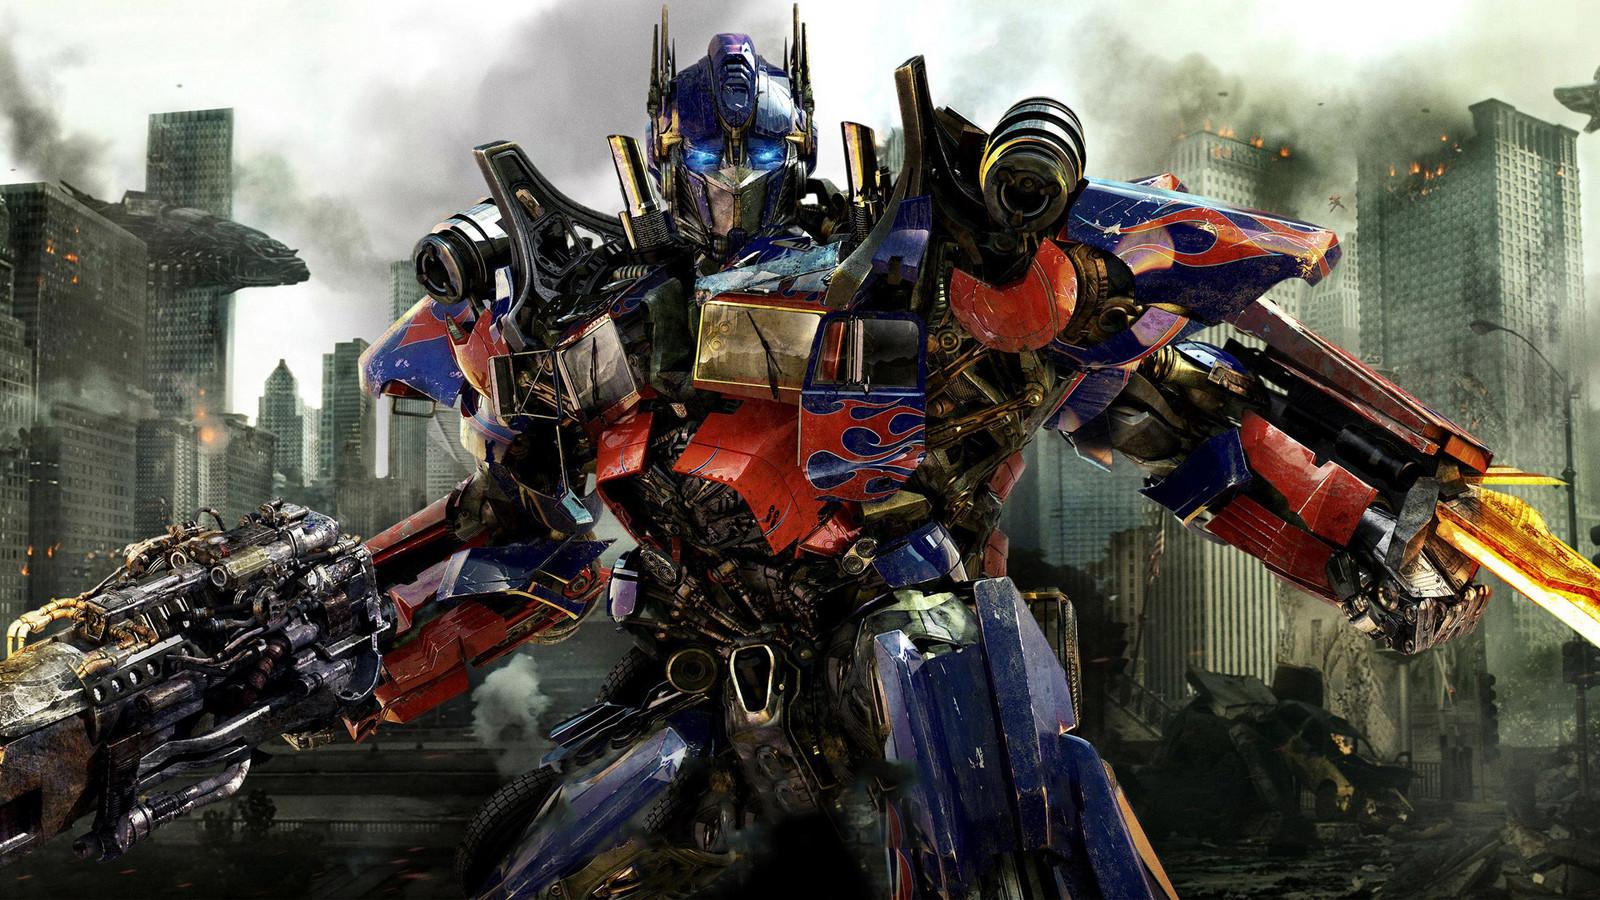 Трансформеры 3: Тёмная сторона Луны (Transformers: Dark of the Moon) 2011